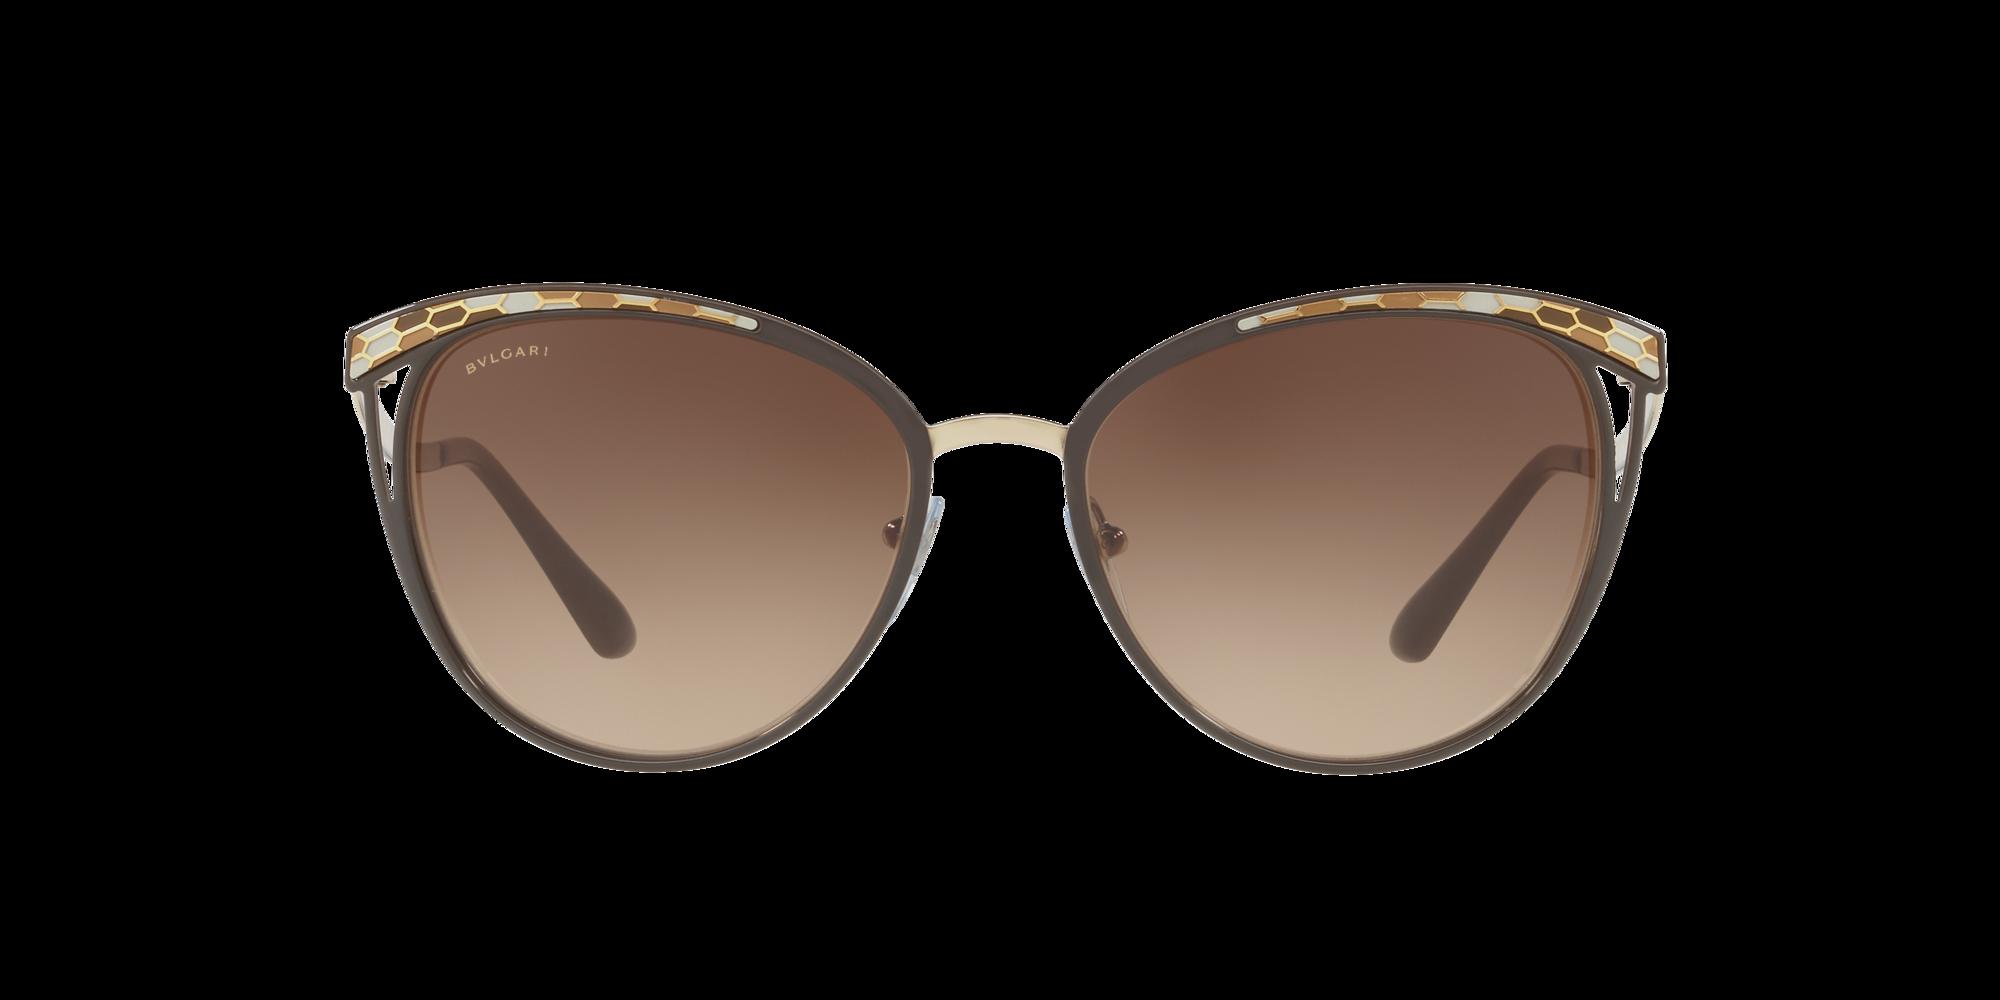 Image for BV6083 56 from LensCrafters | Glasses, Prescription Glasses Online, Eyewear